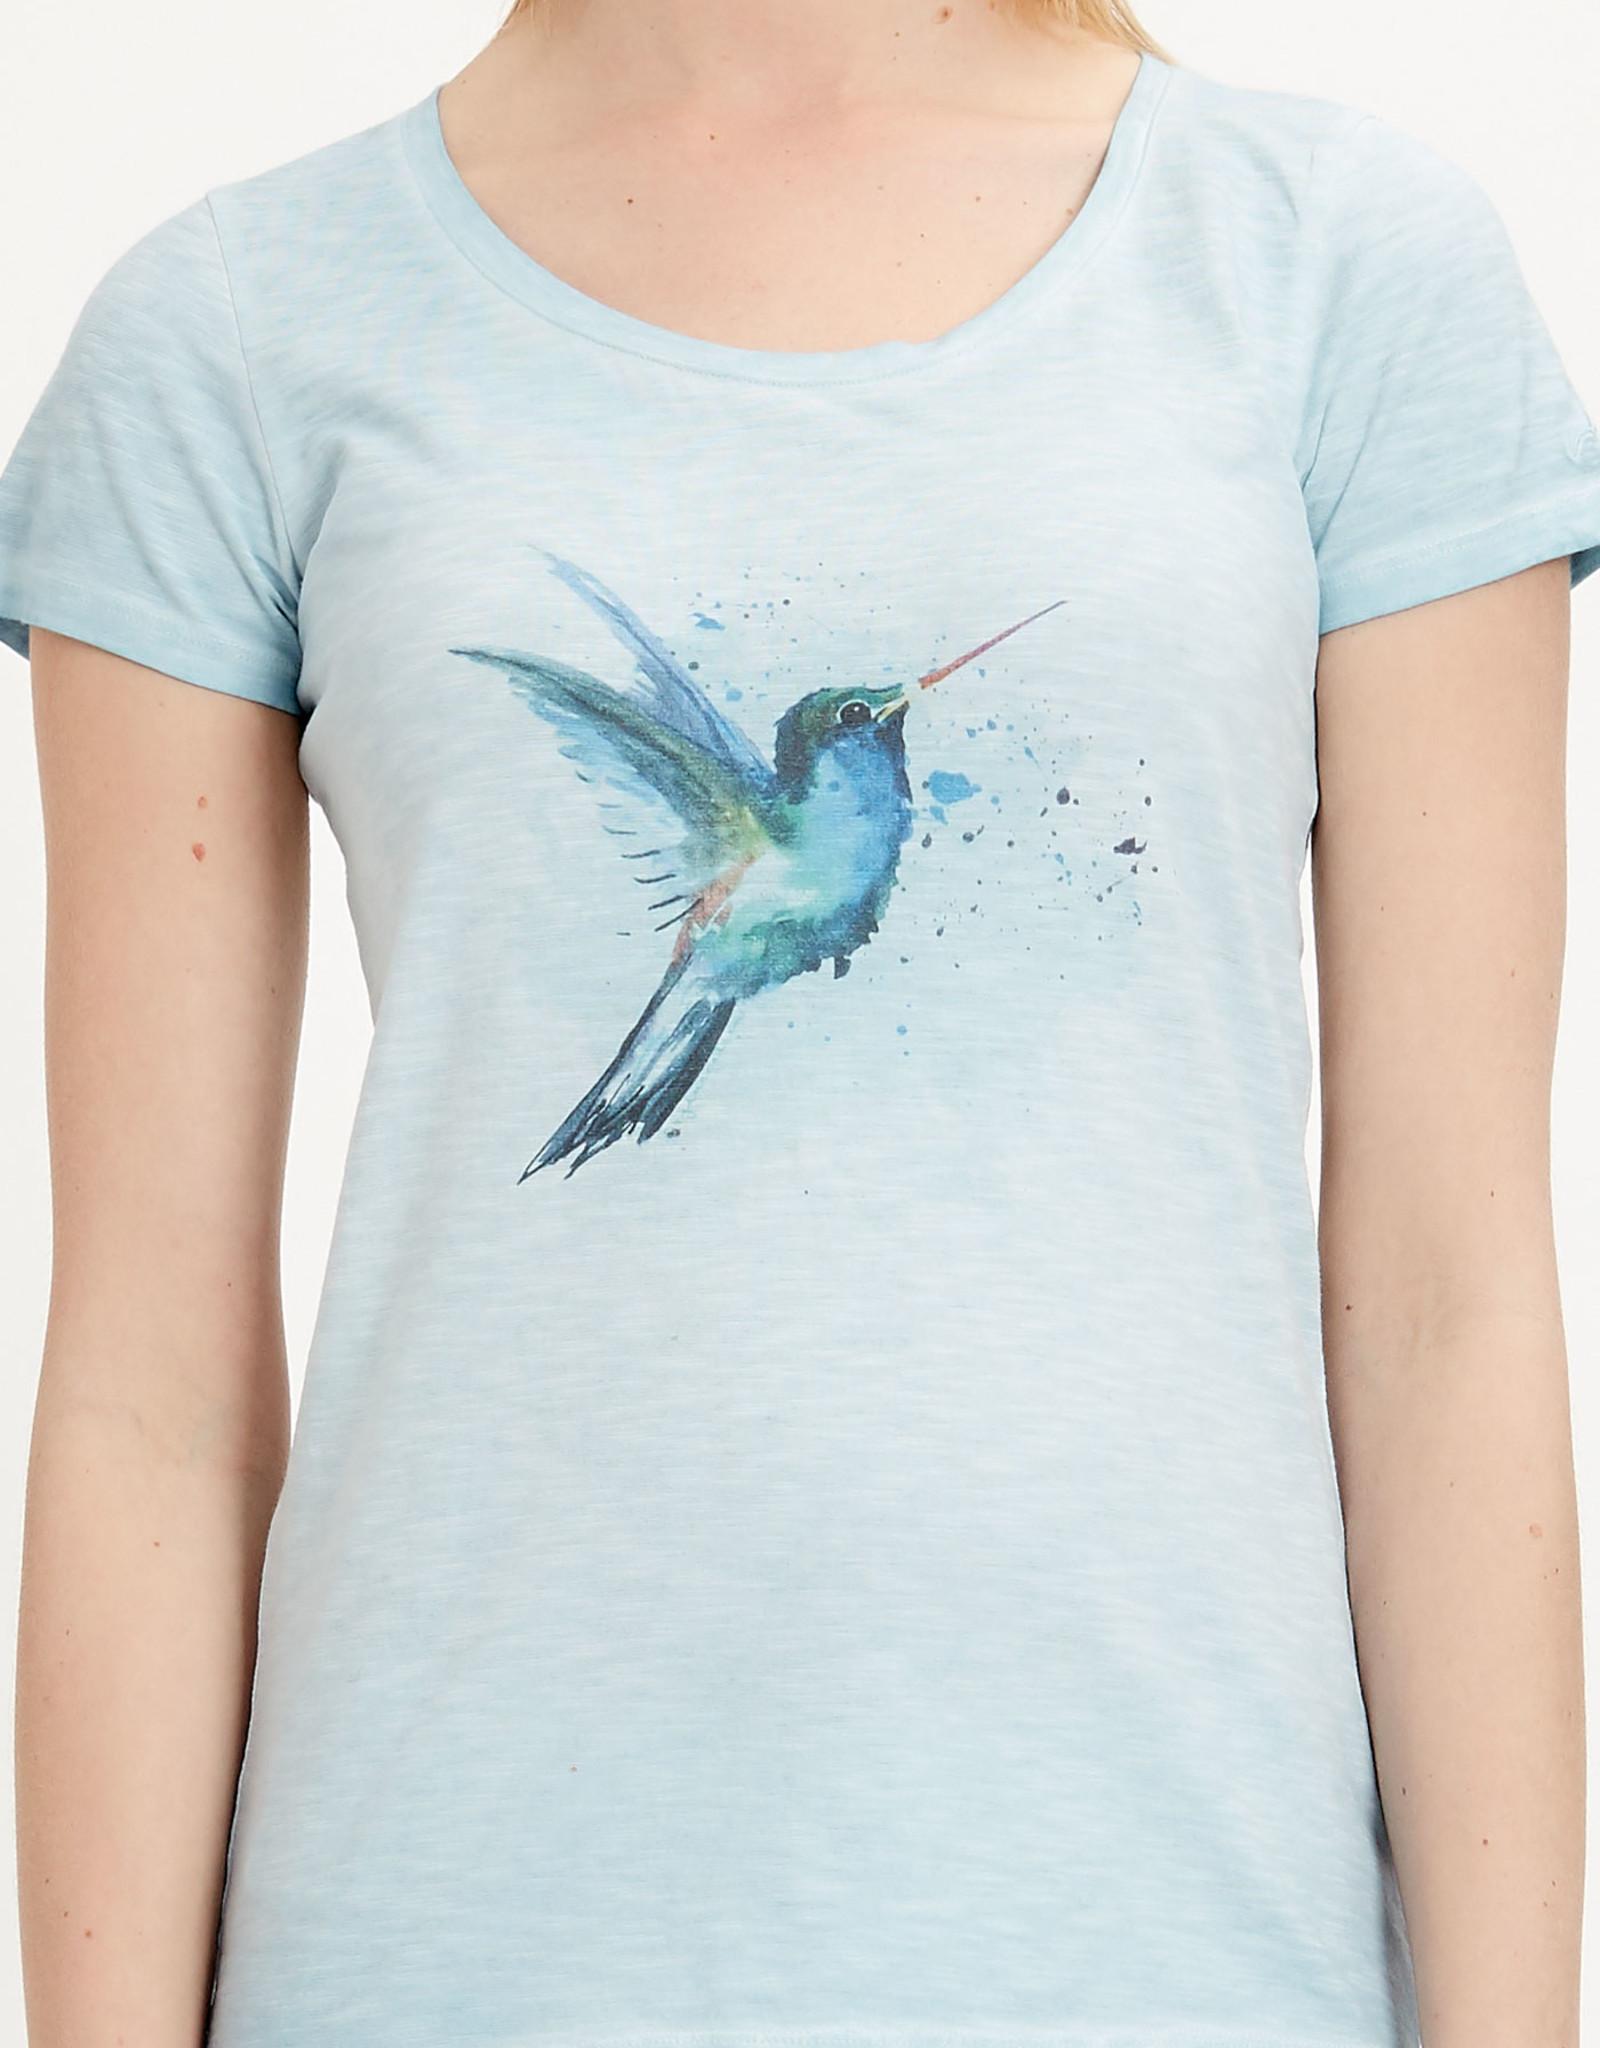 Organication T-SHIRT PRINT BIRD UNIQUE SHADE BLUE